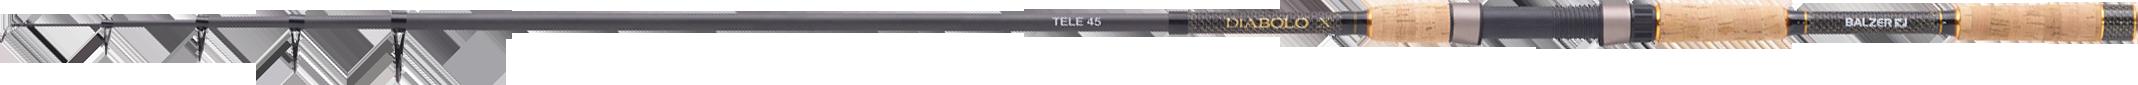 Diabolo X Tele 45